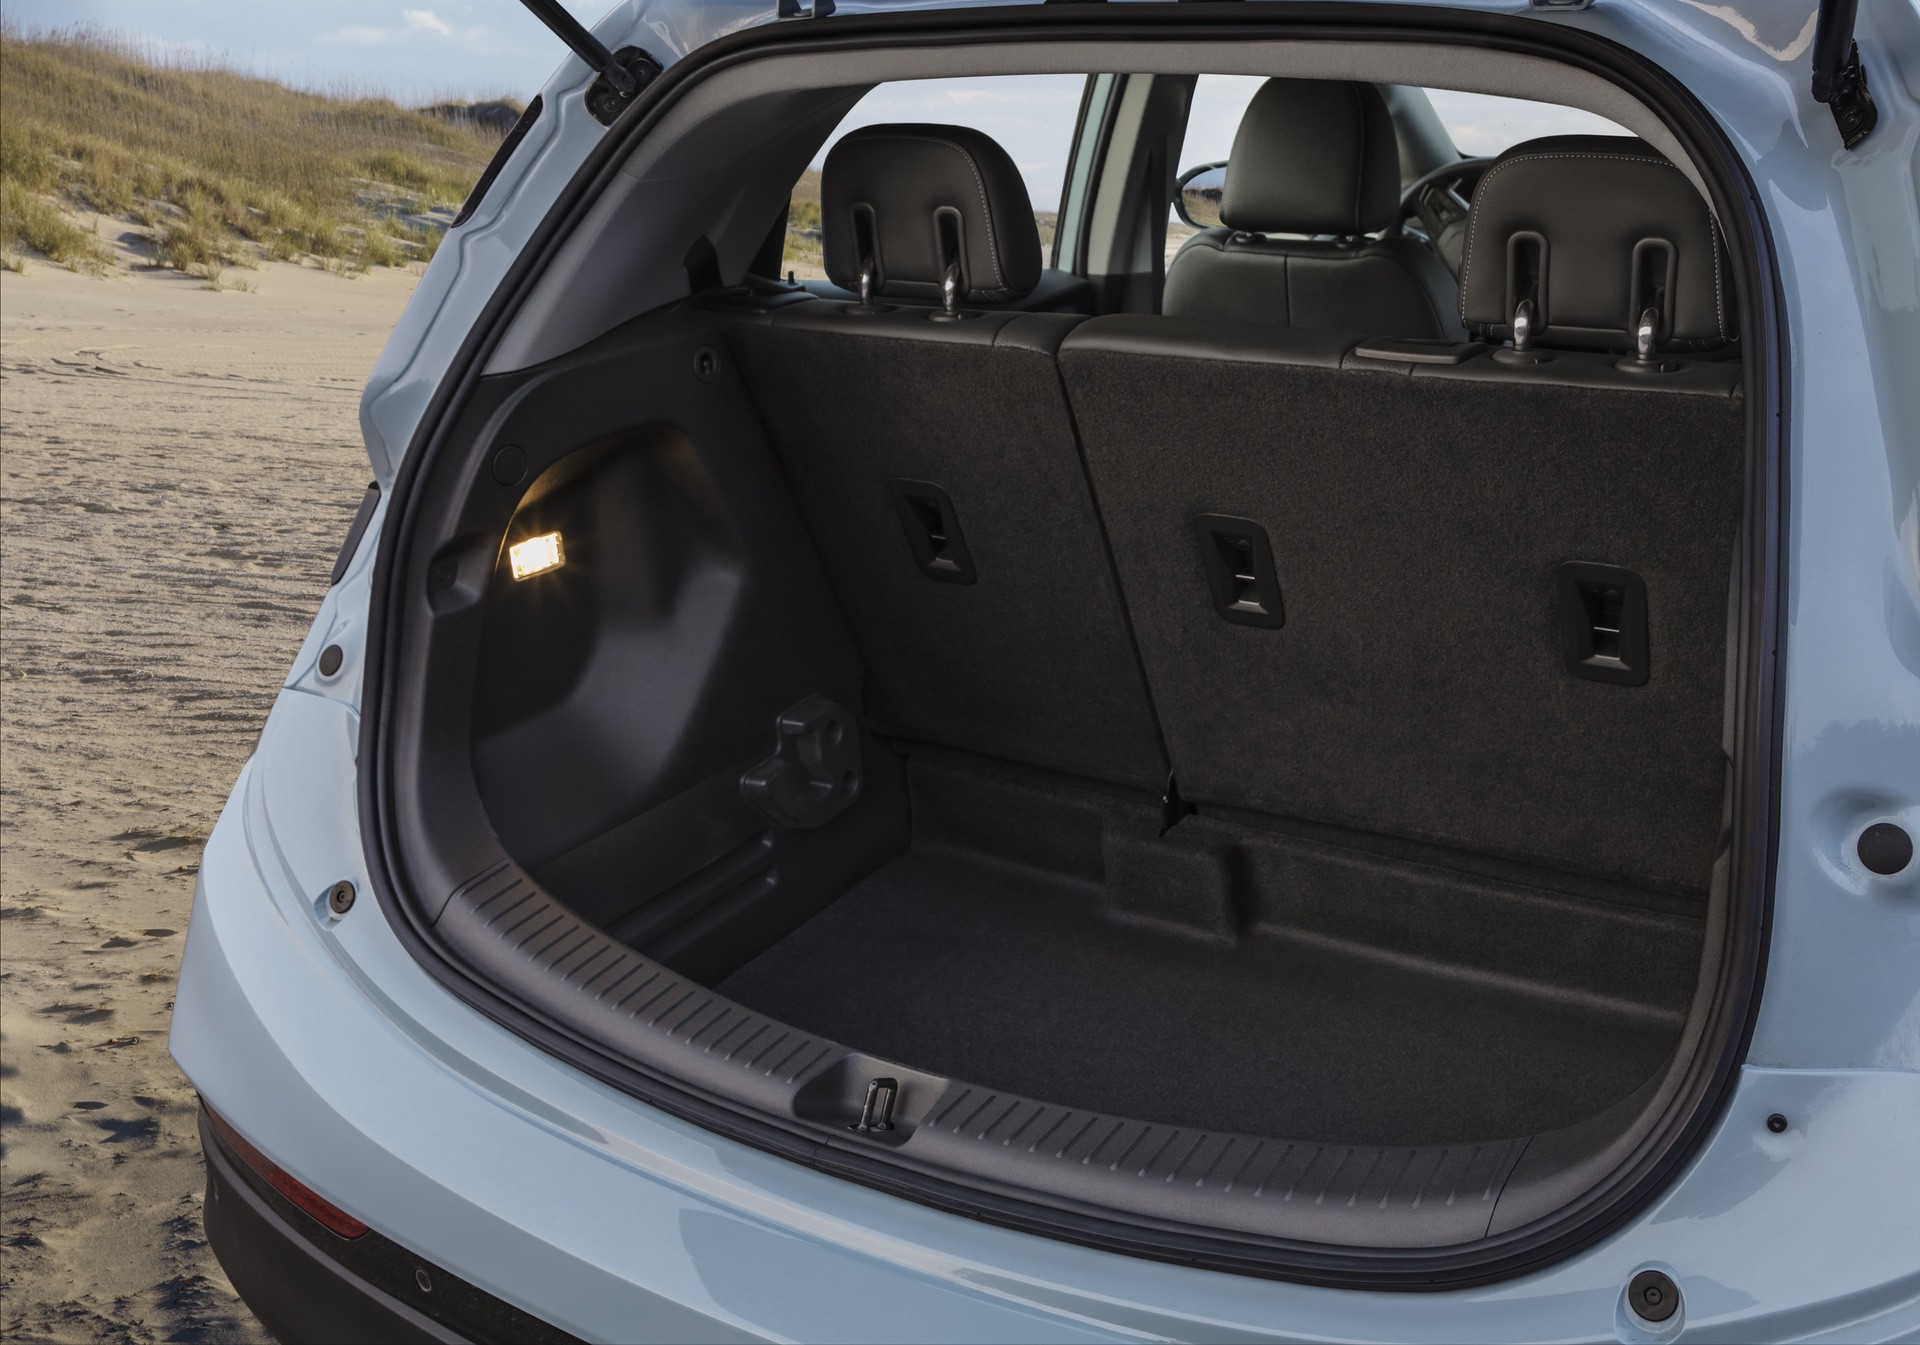 2022 Chevrolet Bolt EV